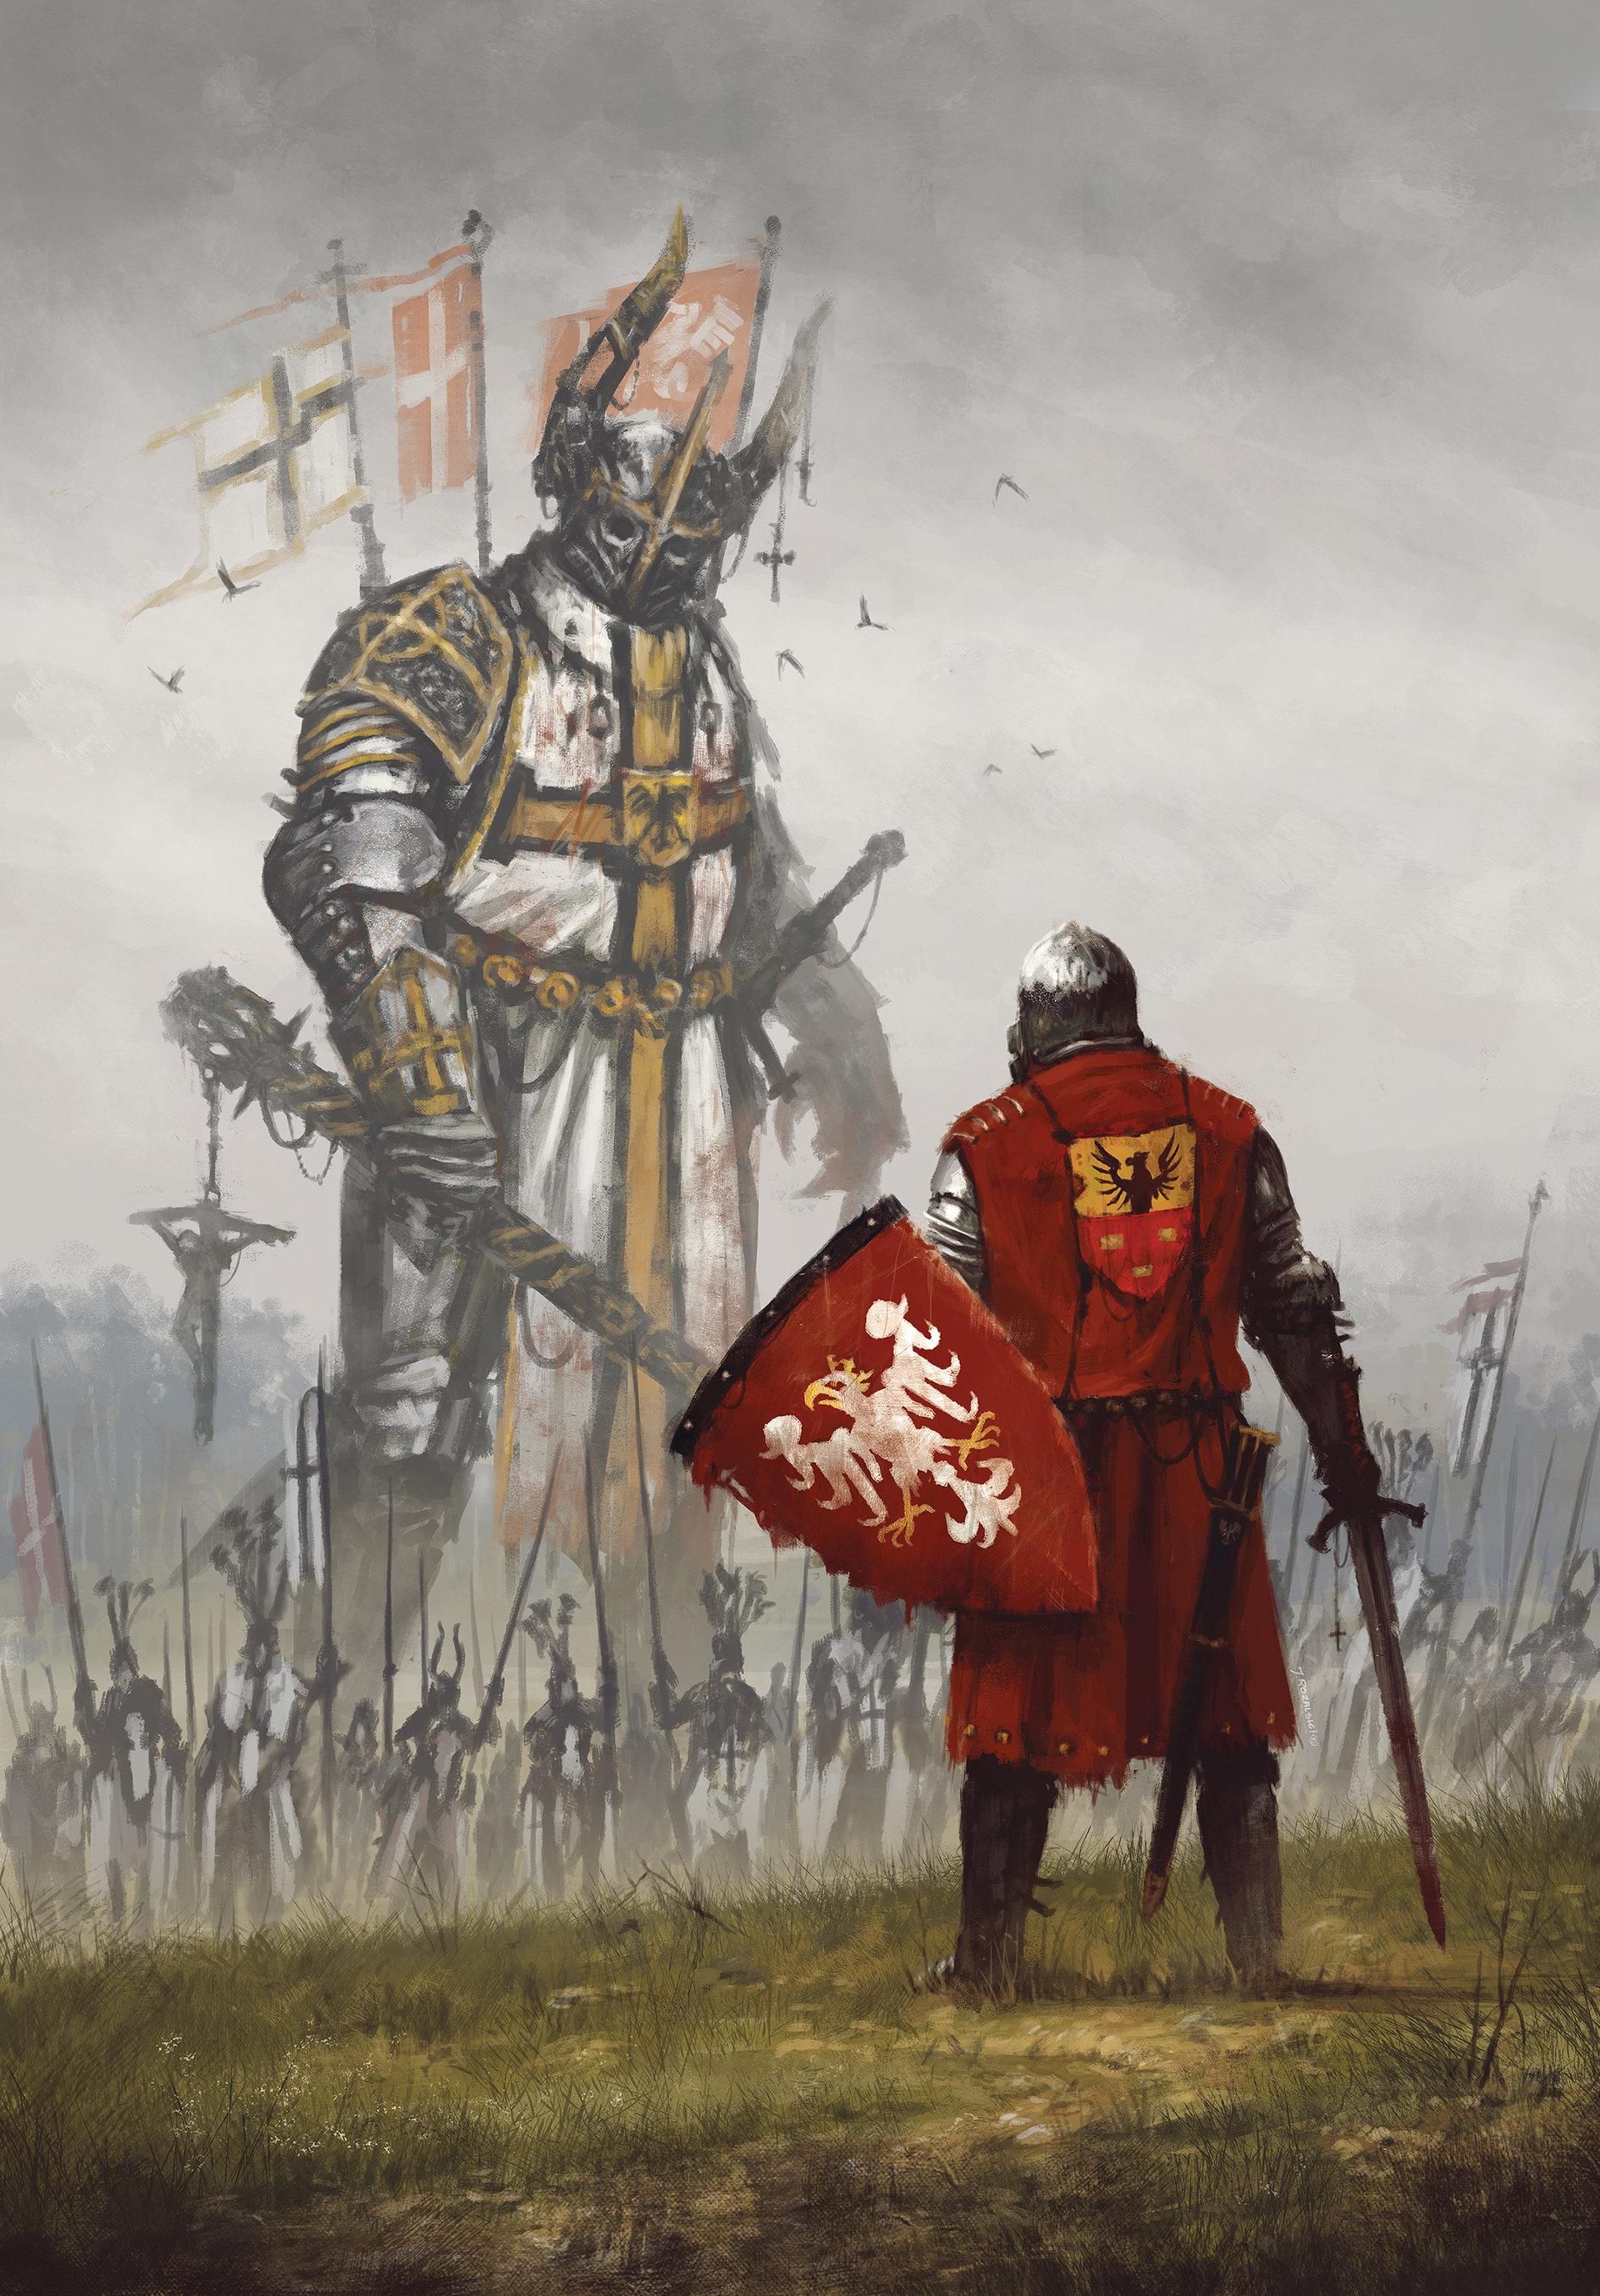 Drawn warrior giant Original Information rozalski jakub Danbooru